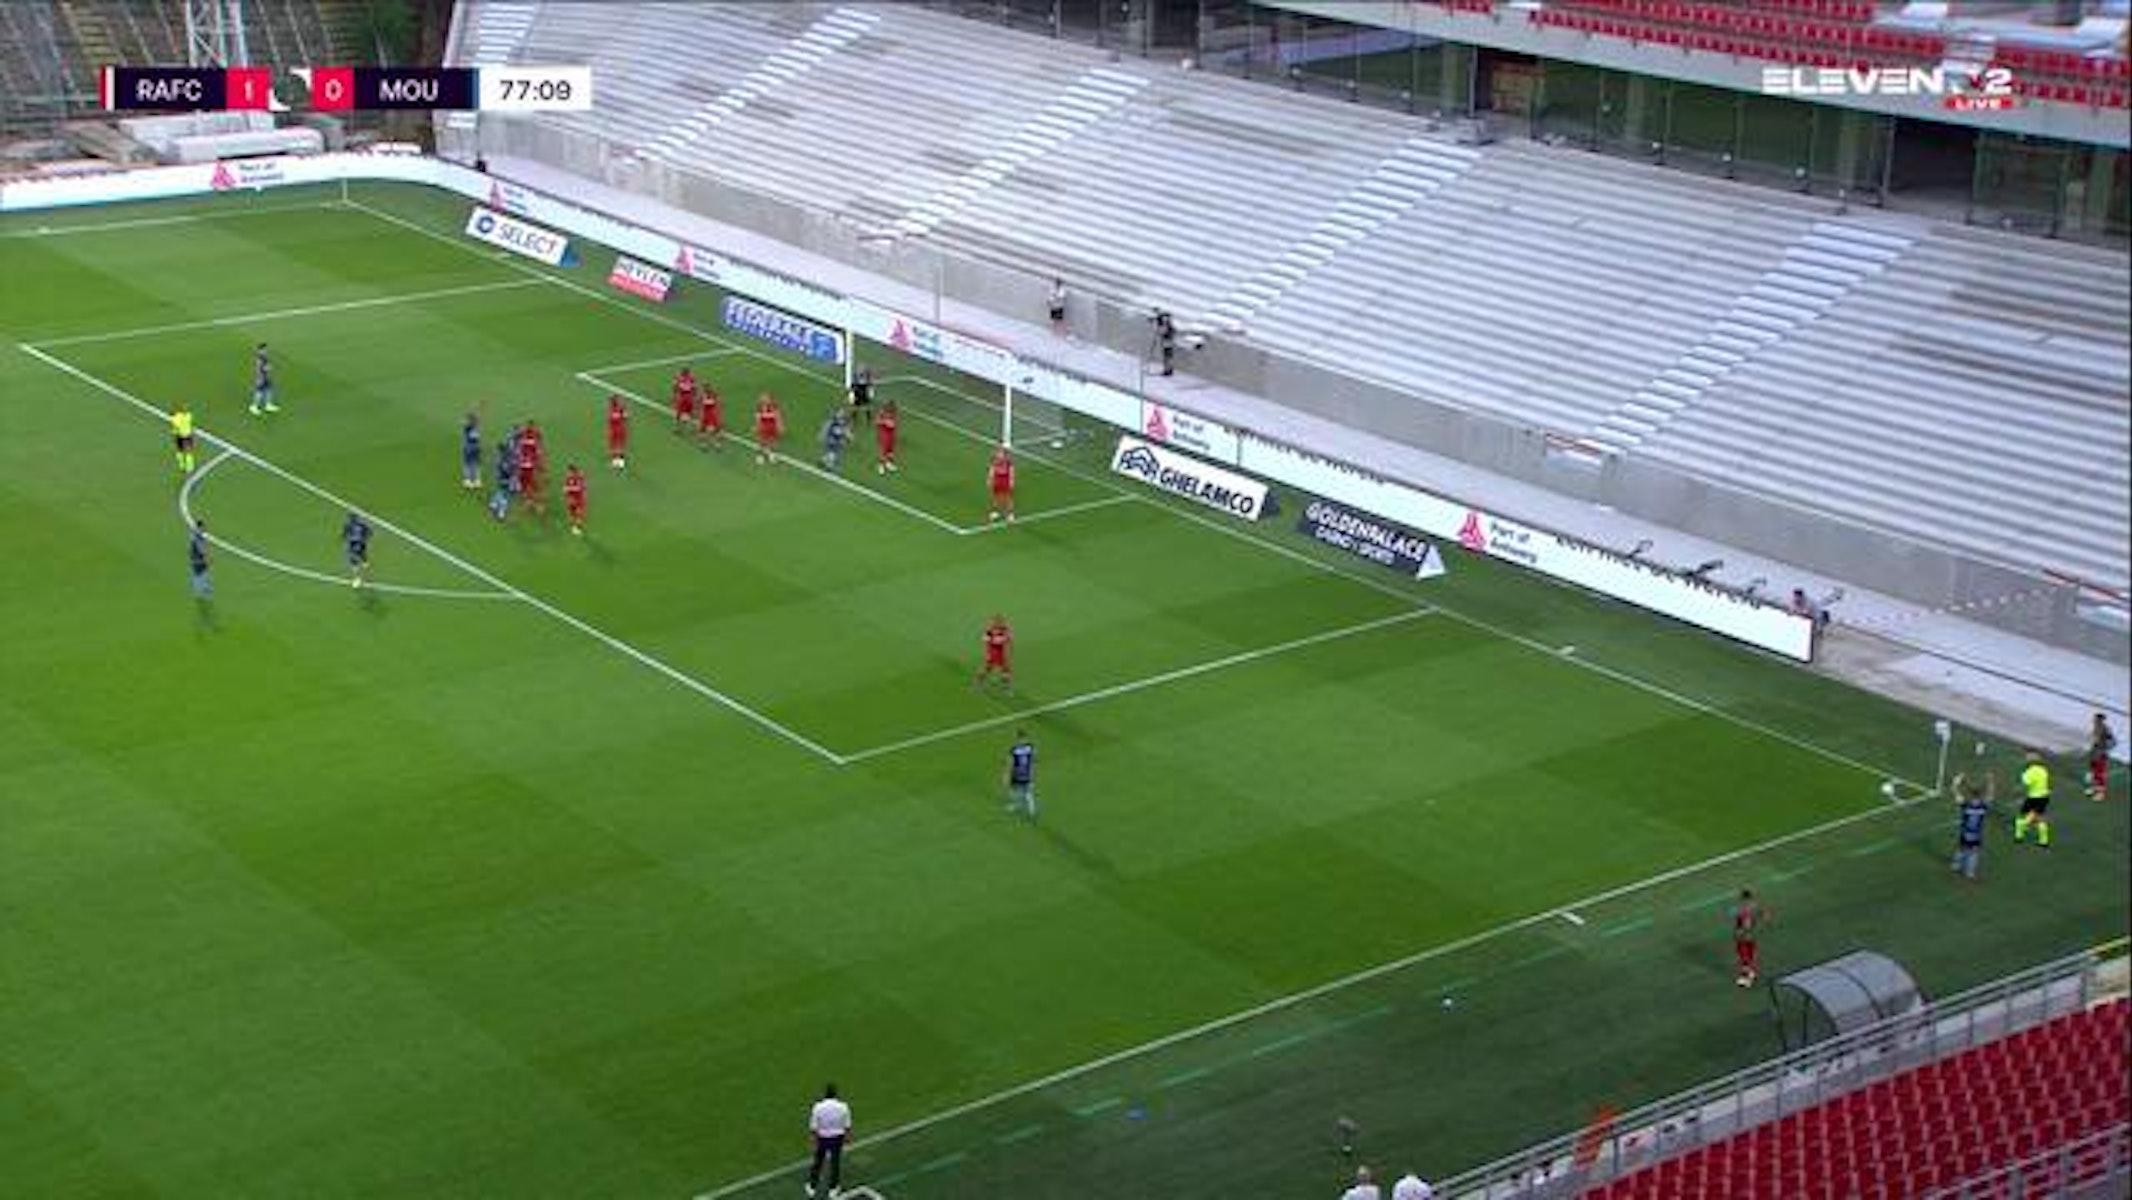 Doelpunt Marko Bakic (Royal Antwerp FC vs. Royal Excel Mouscron)